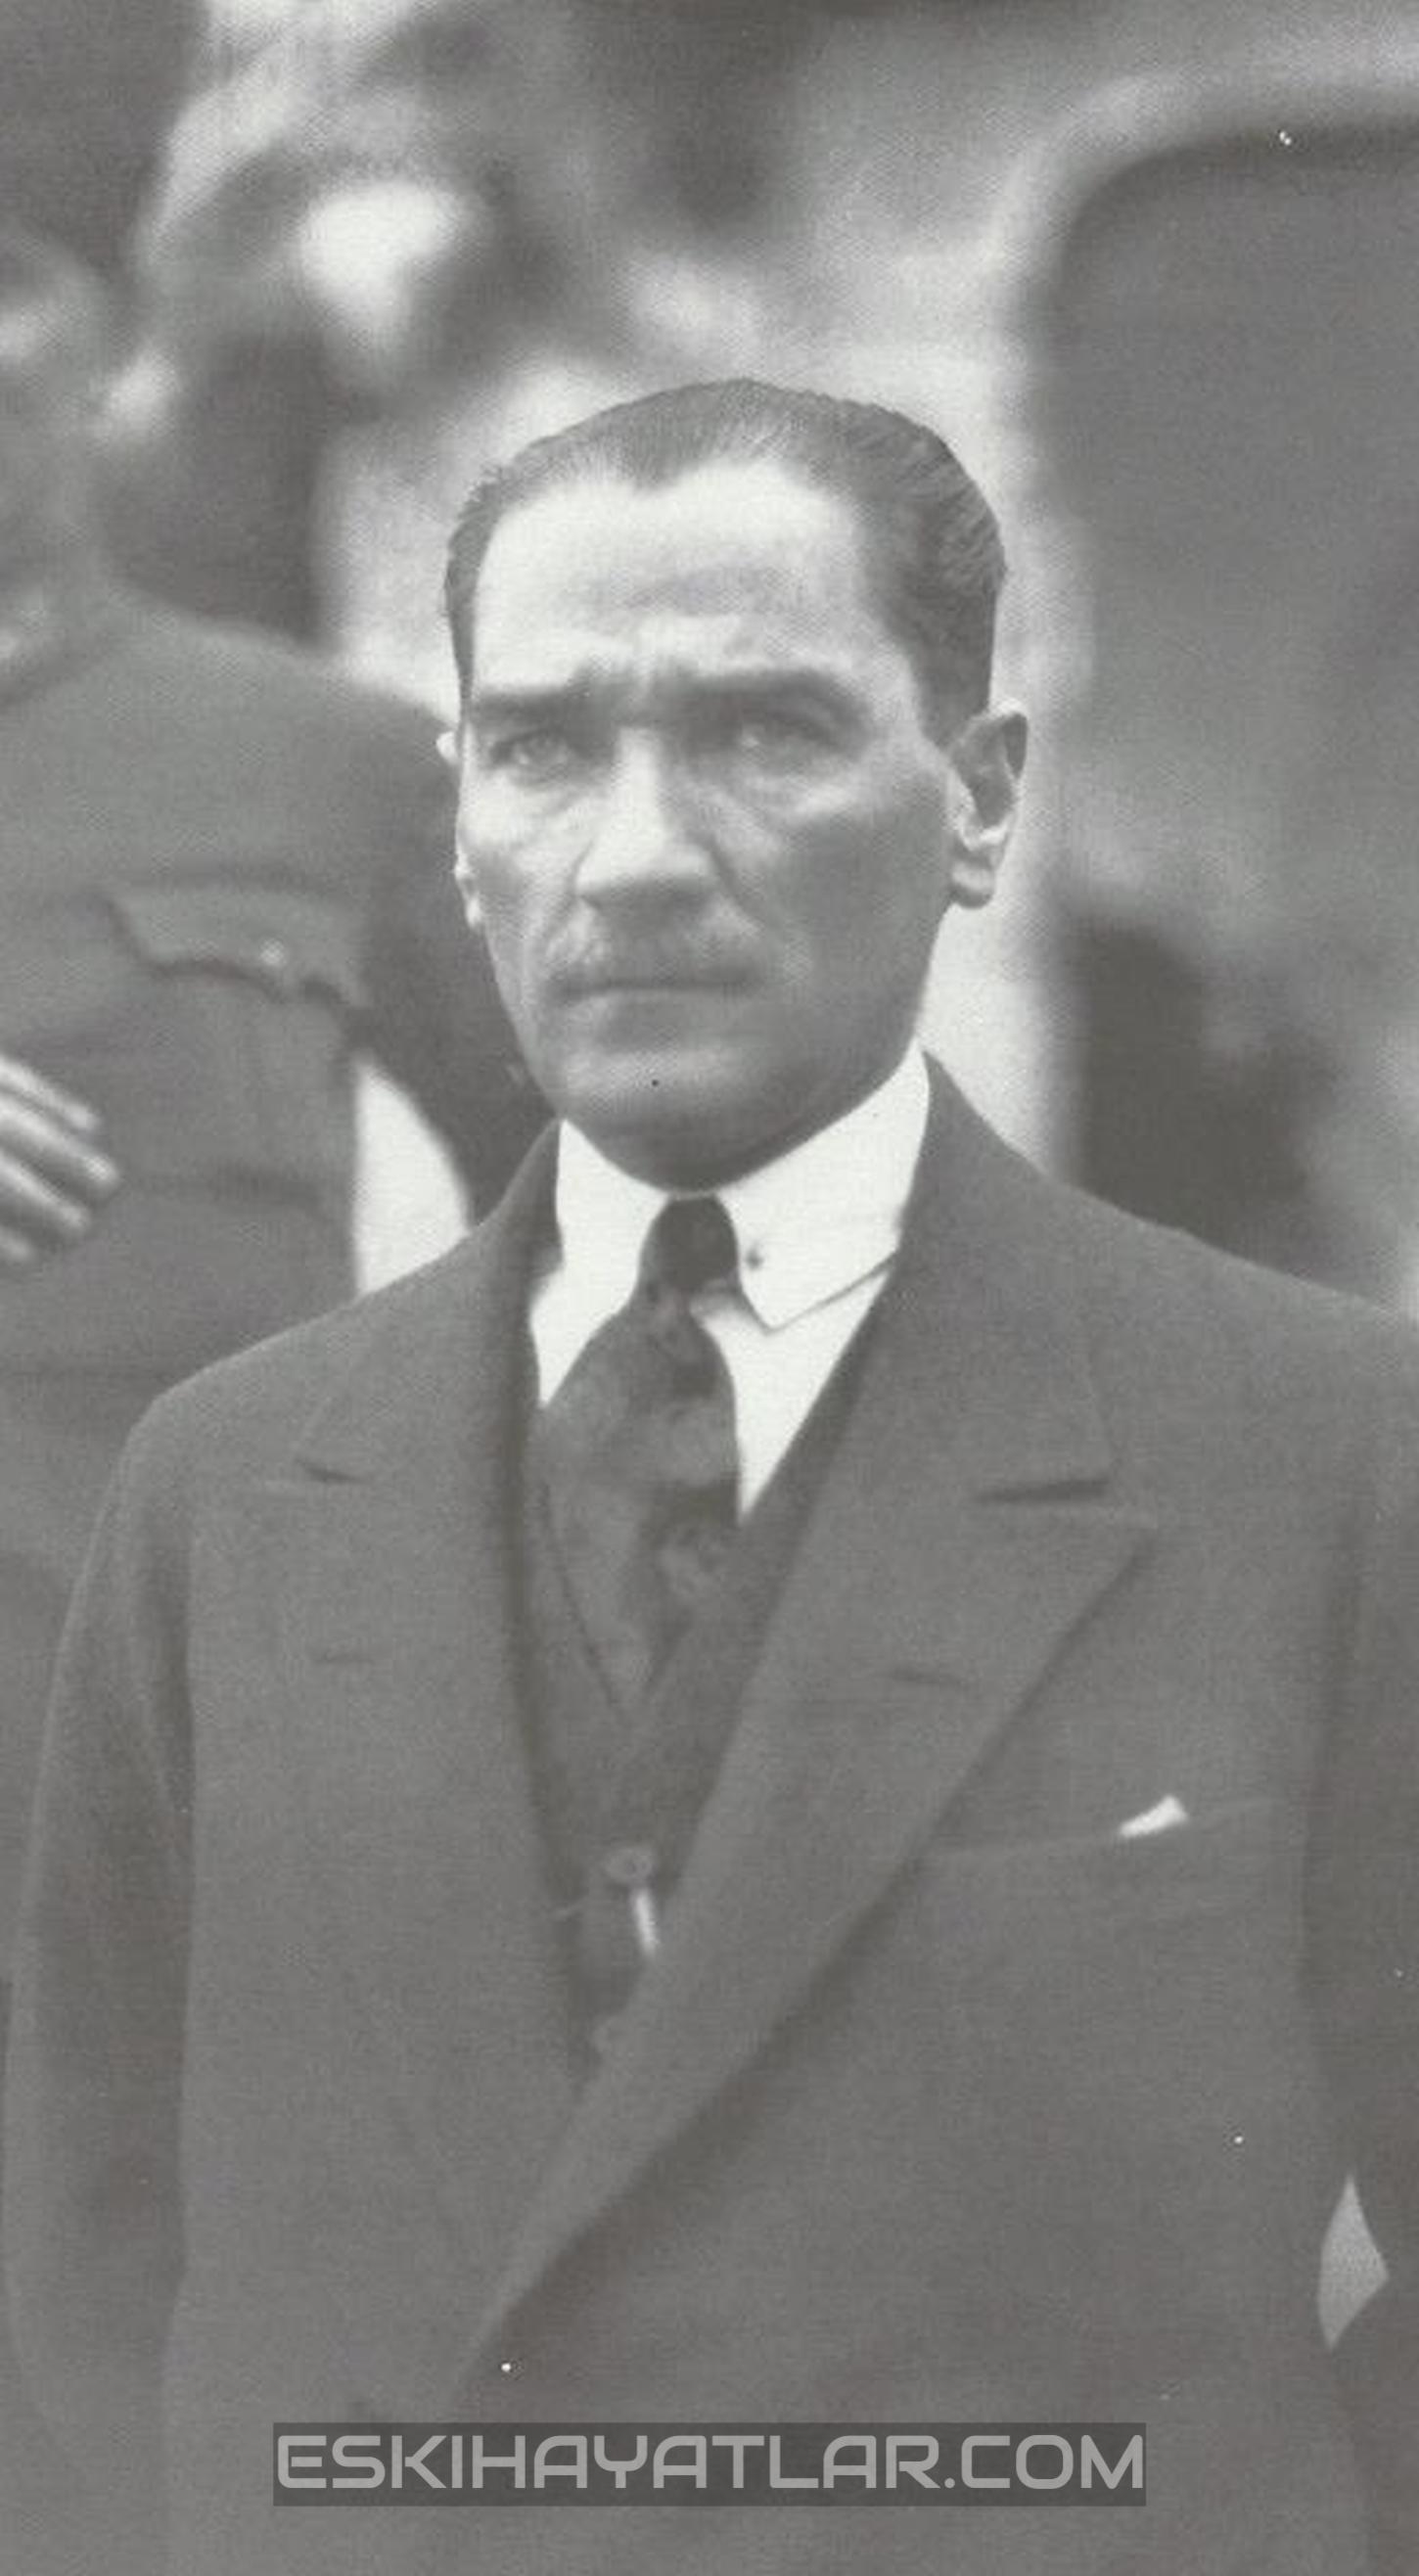 ataturk-izmir-gunleri-mustafa-kemal-pasa-1922-izmir-fotograflari (014)